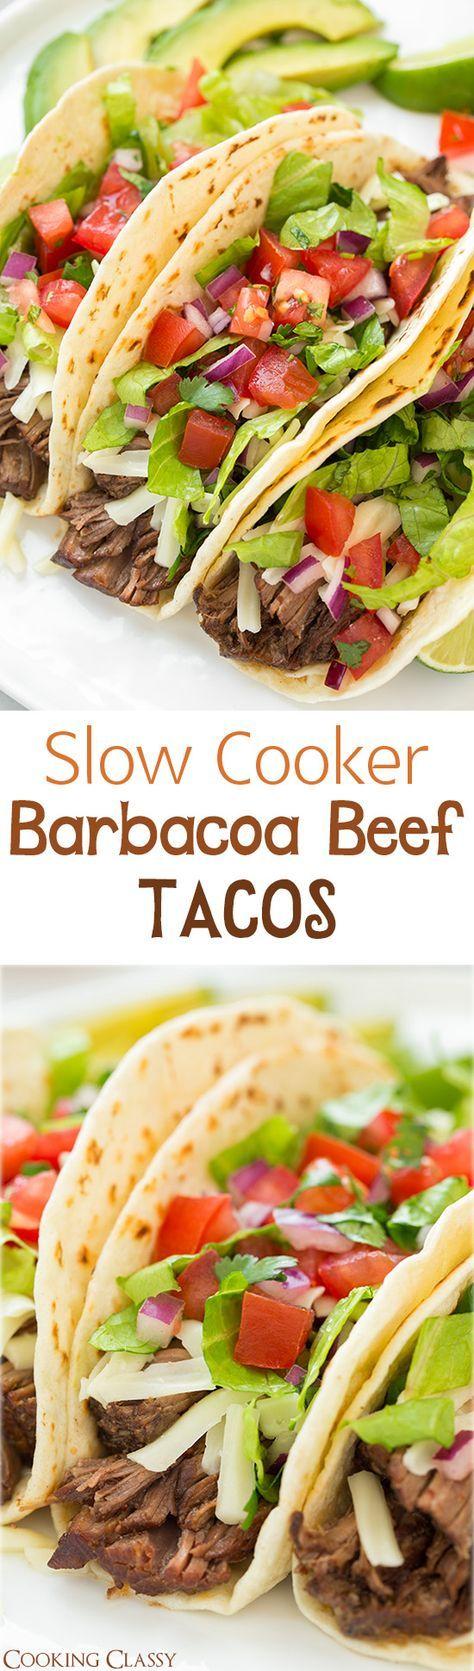 Slow Cooker Barbacoa Beef Tacos (Chipotle Copycat) | Recipe | Slow ...